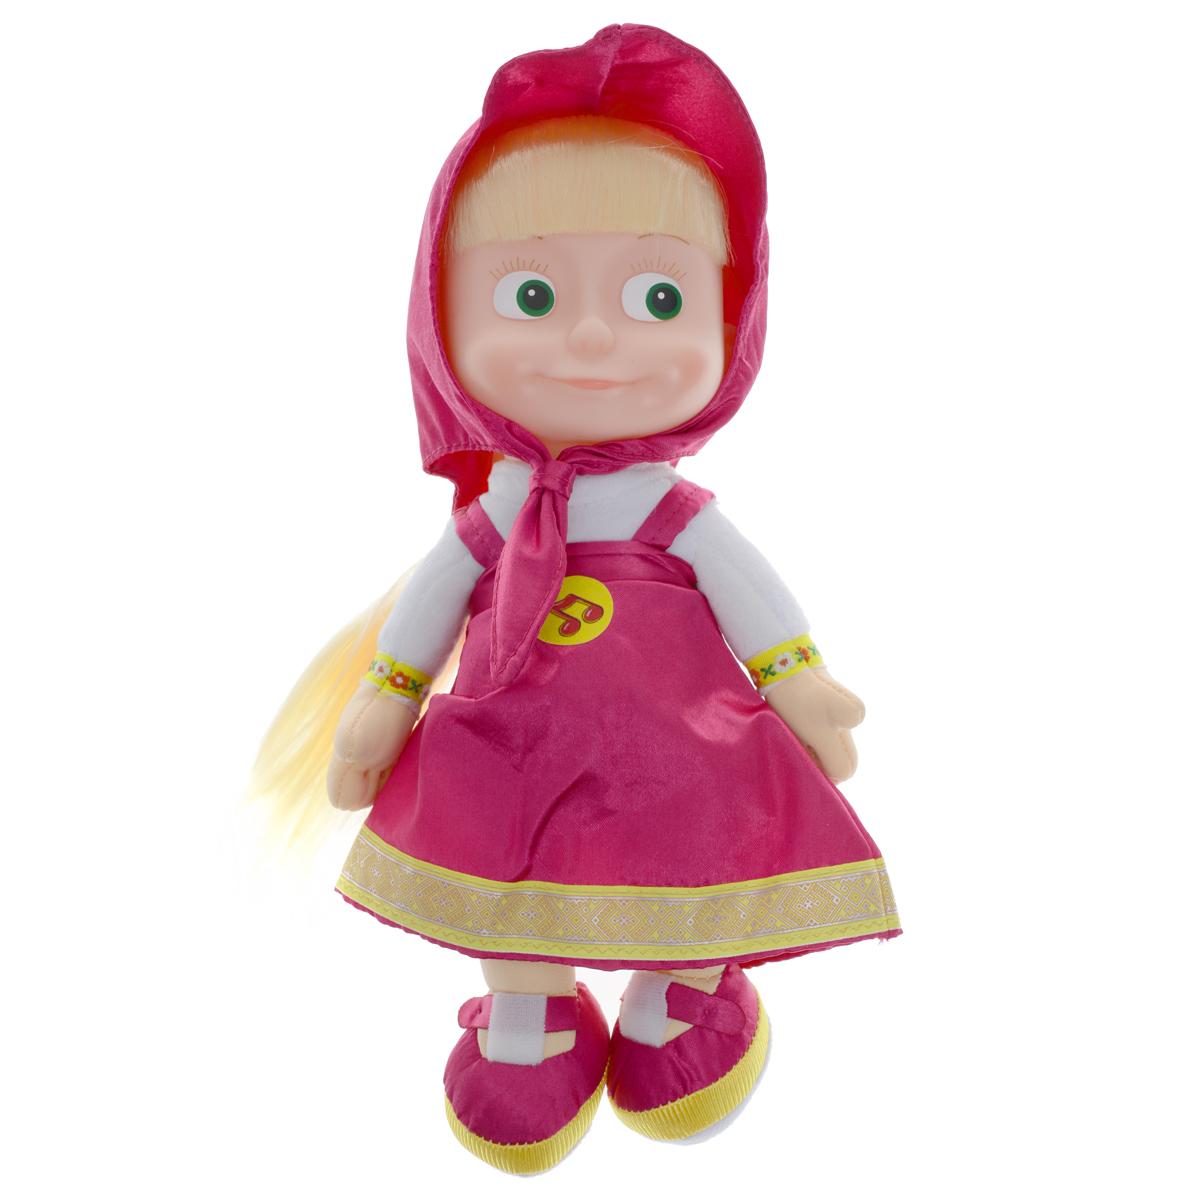 Мульти-Пульти Мягкая кукла Маша мульти пульти мягкая игрушка принцесса луна 18 см со звуком my little pony мульти пульти